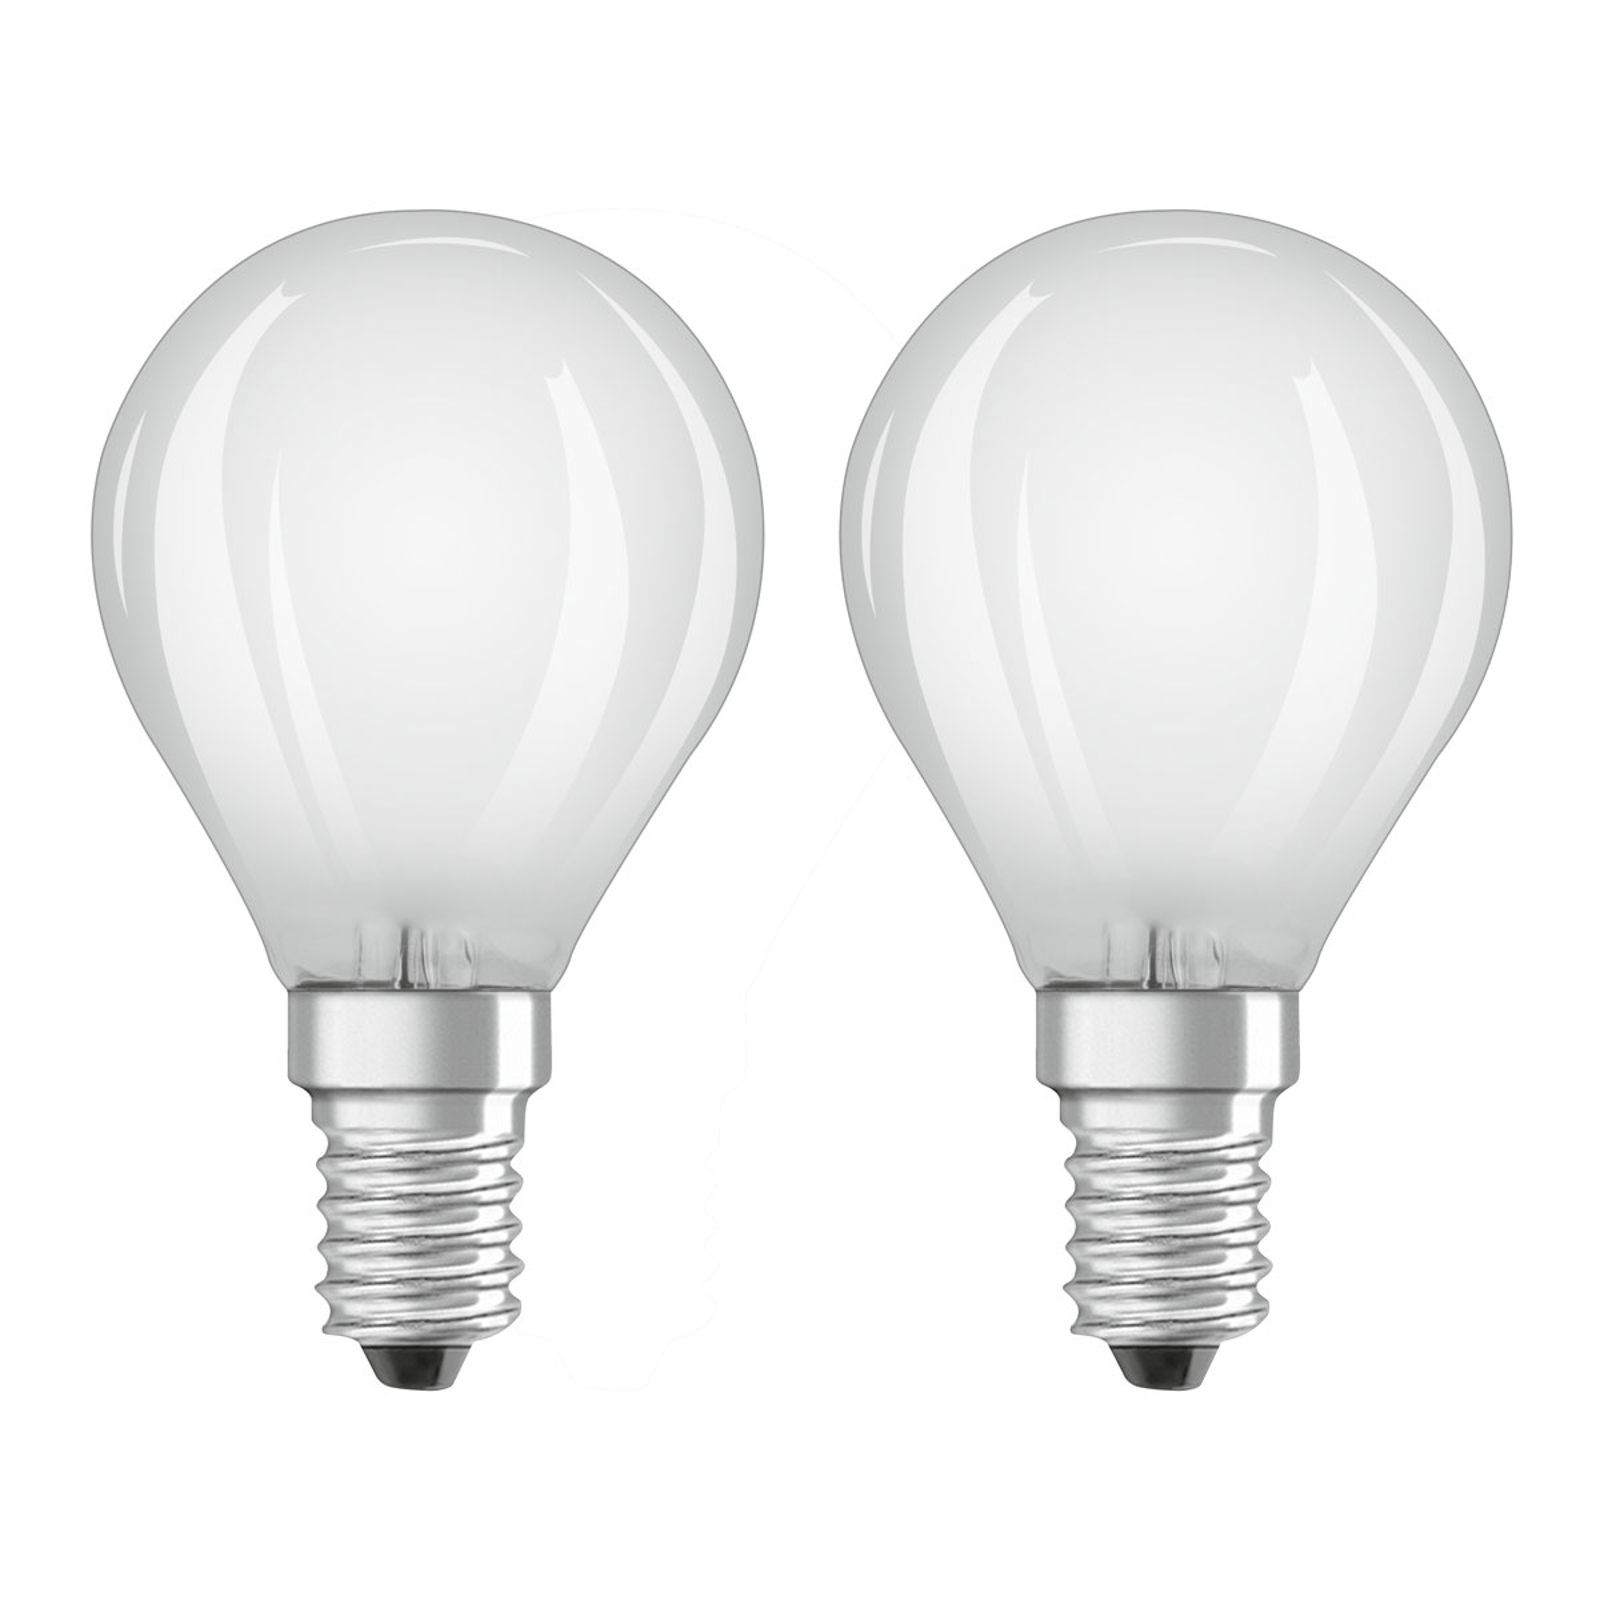 OSRAM LED-Tropfenlampe E14 4W warmweiß 2er-Pack